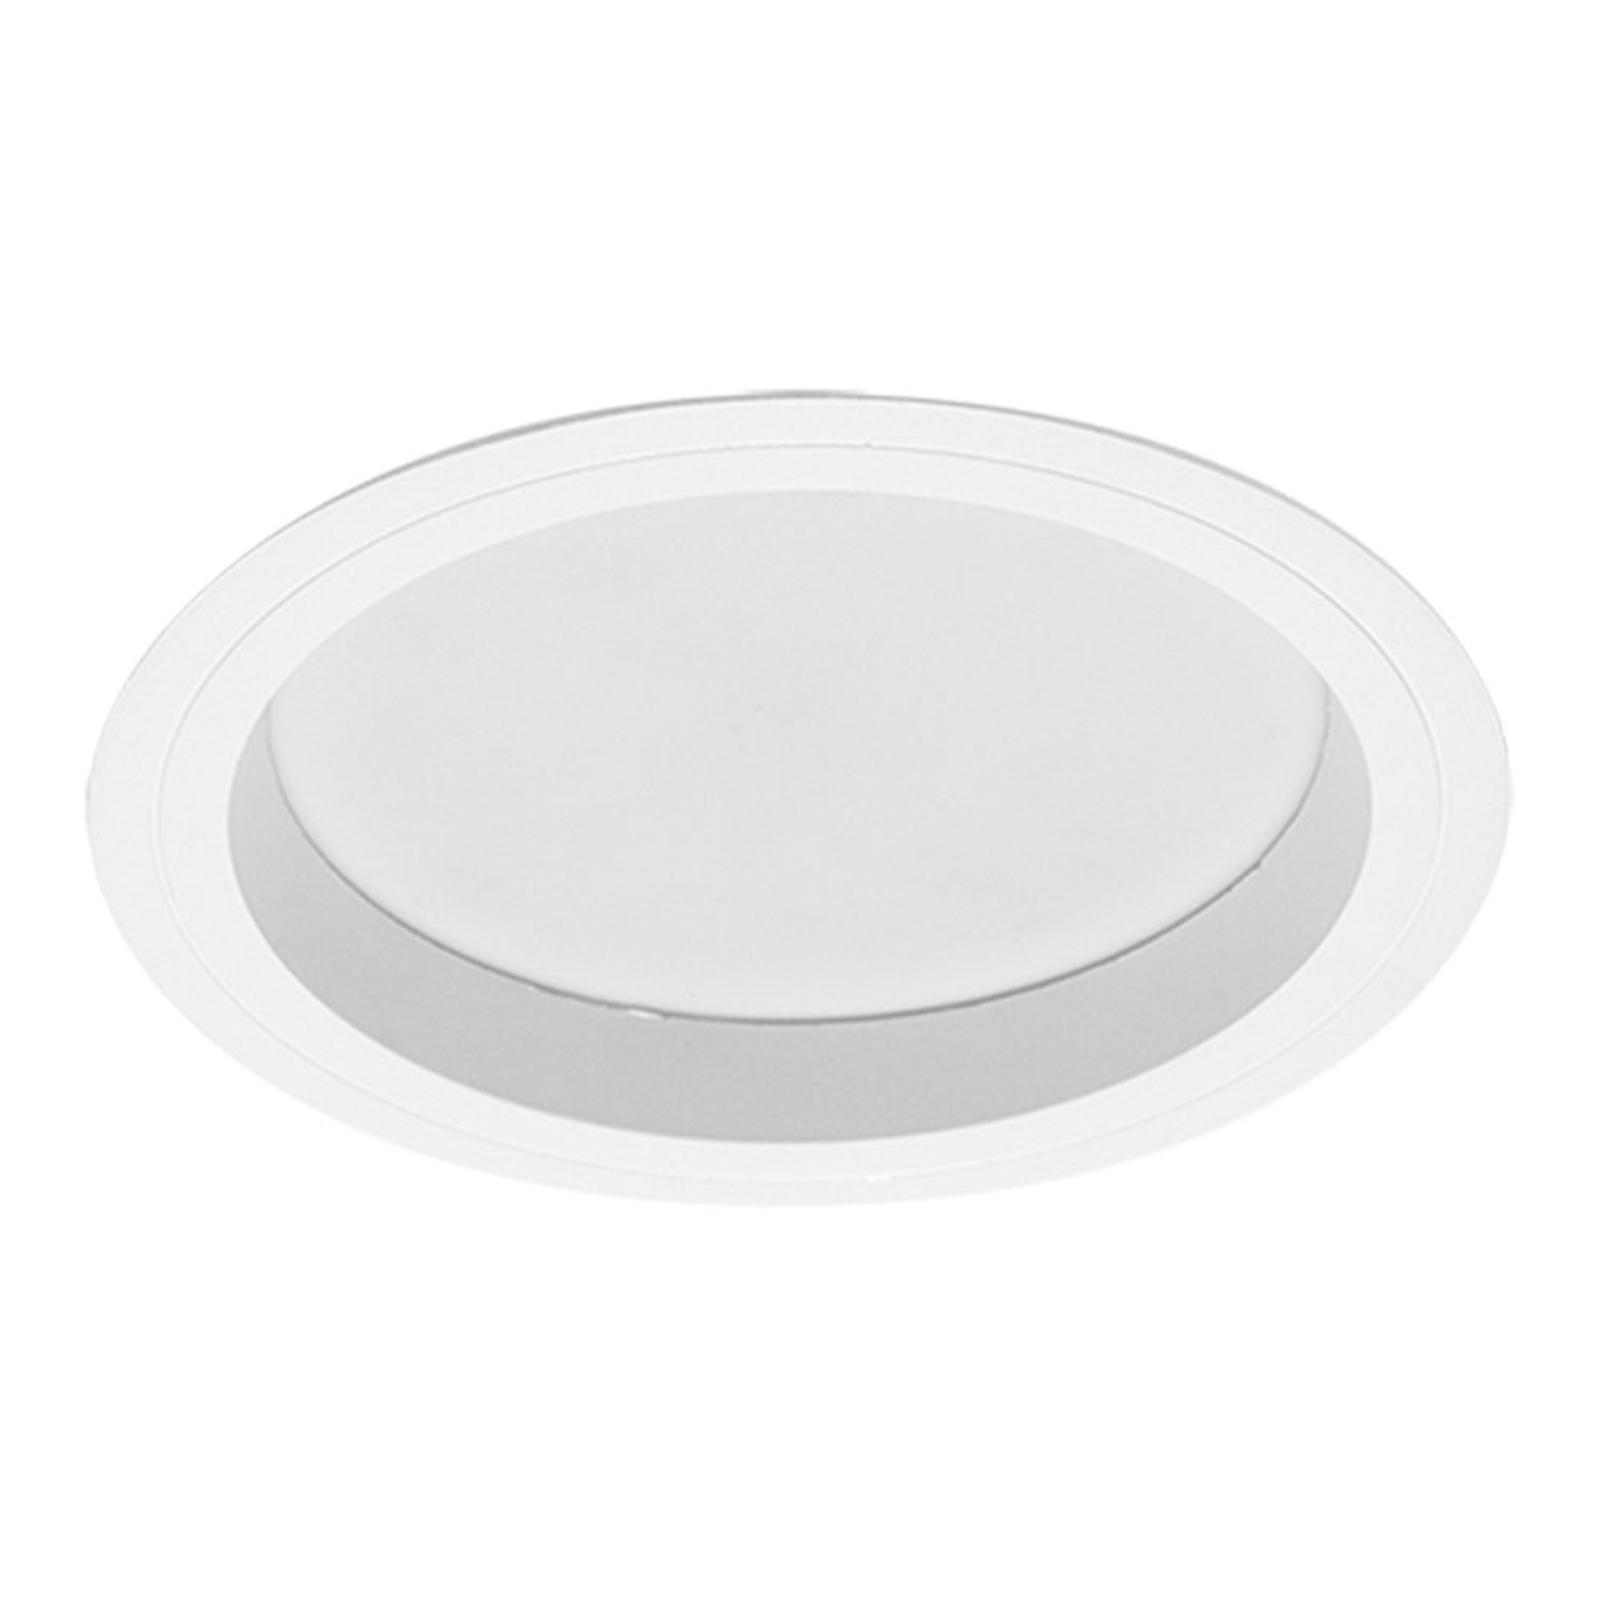 LED-uppovalaisin relo-RDES-O/190 2 014 lm 4 000 K